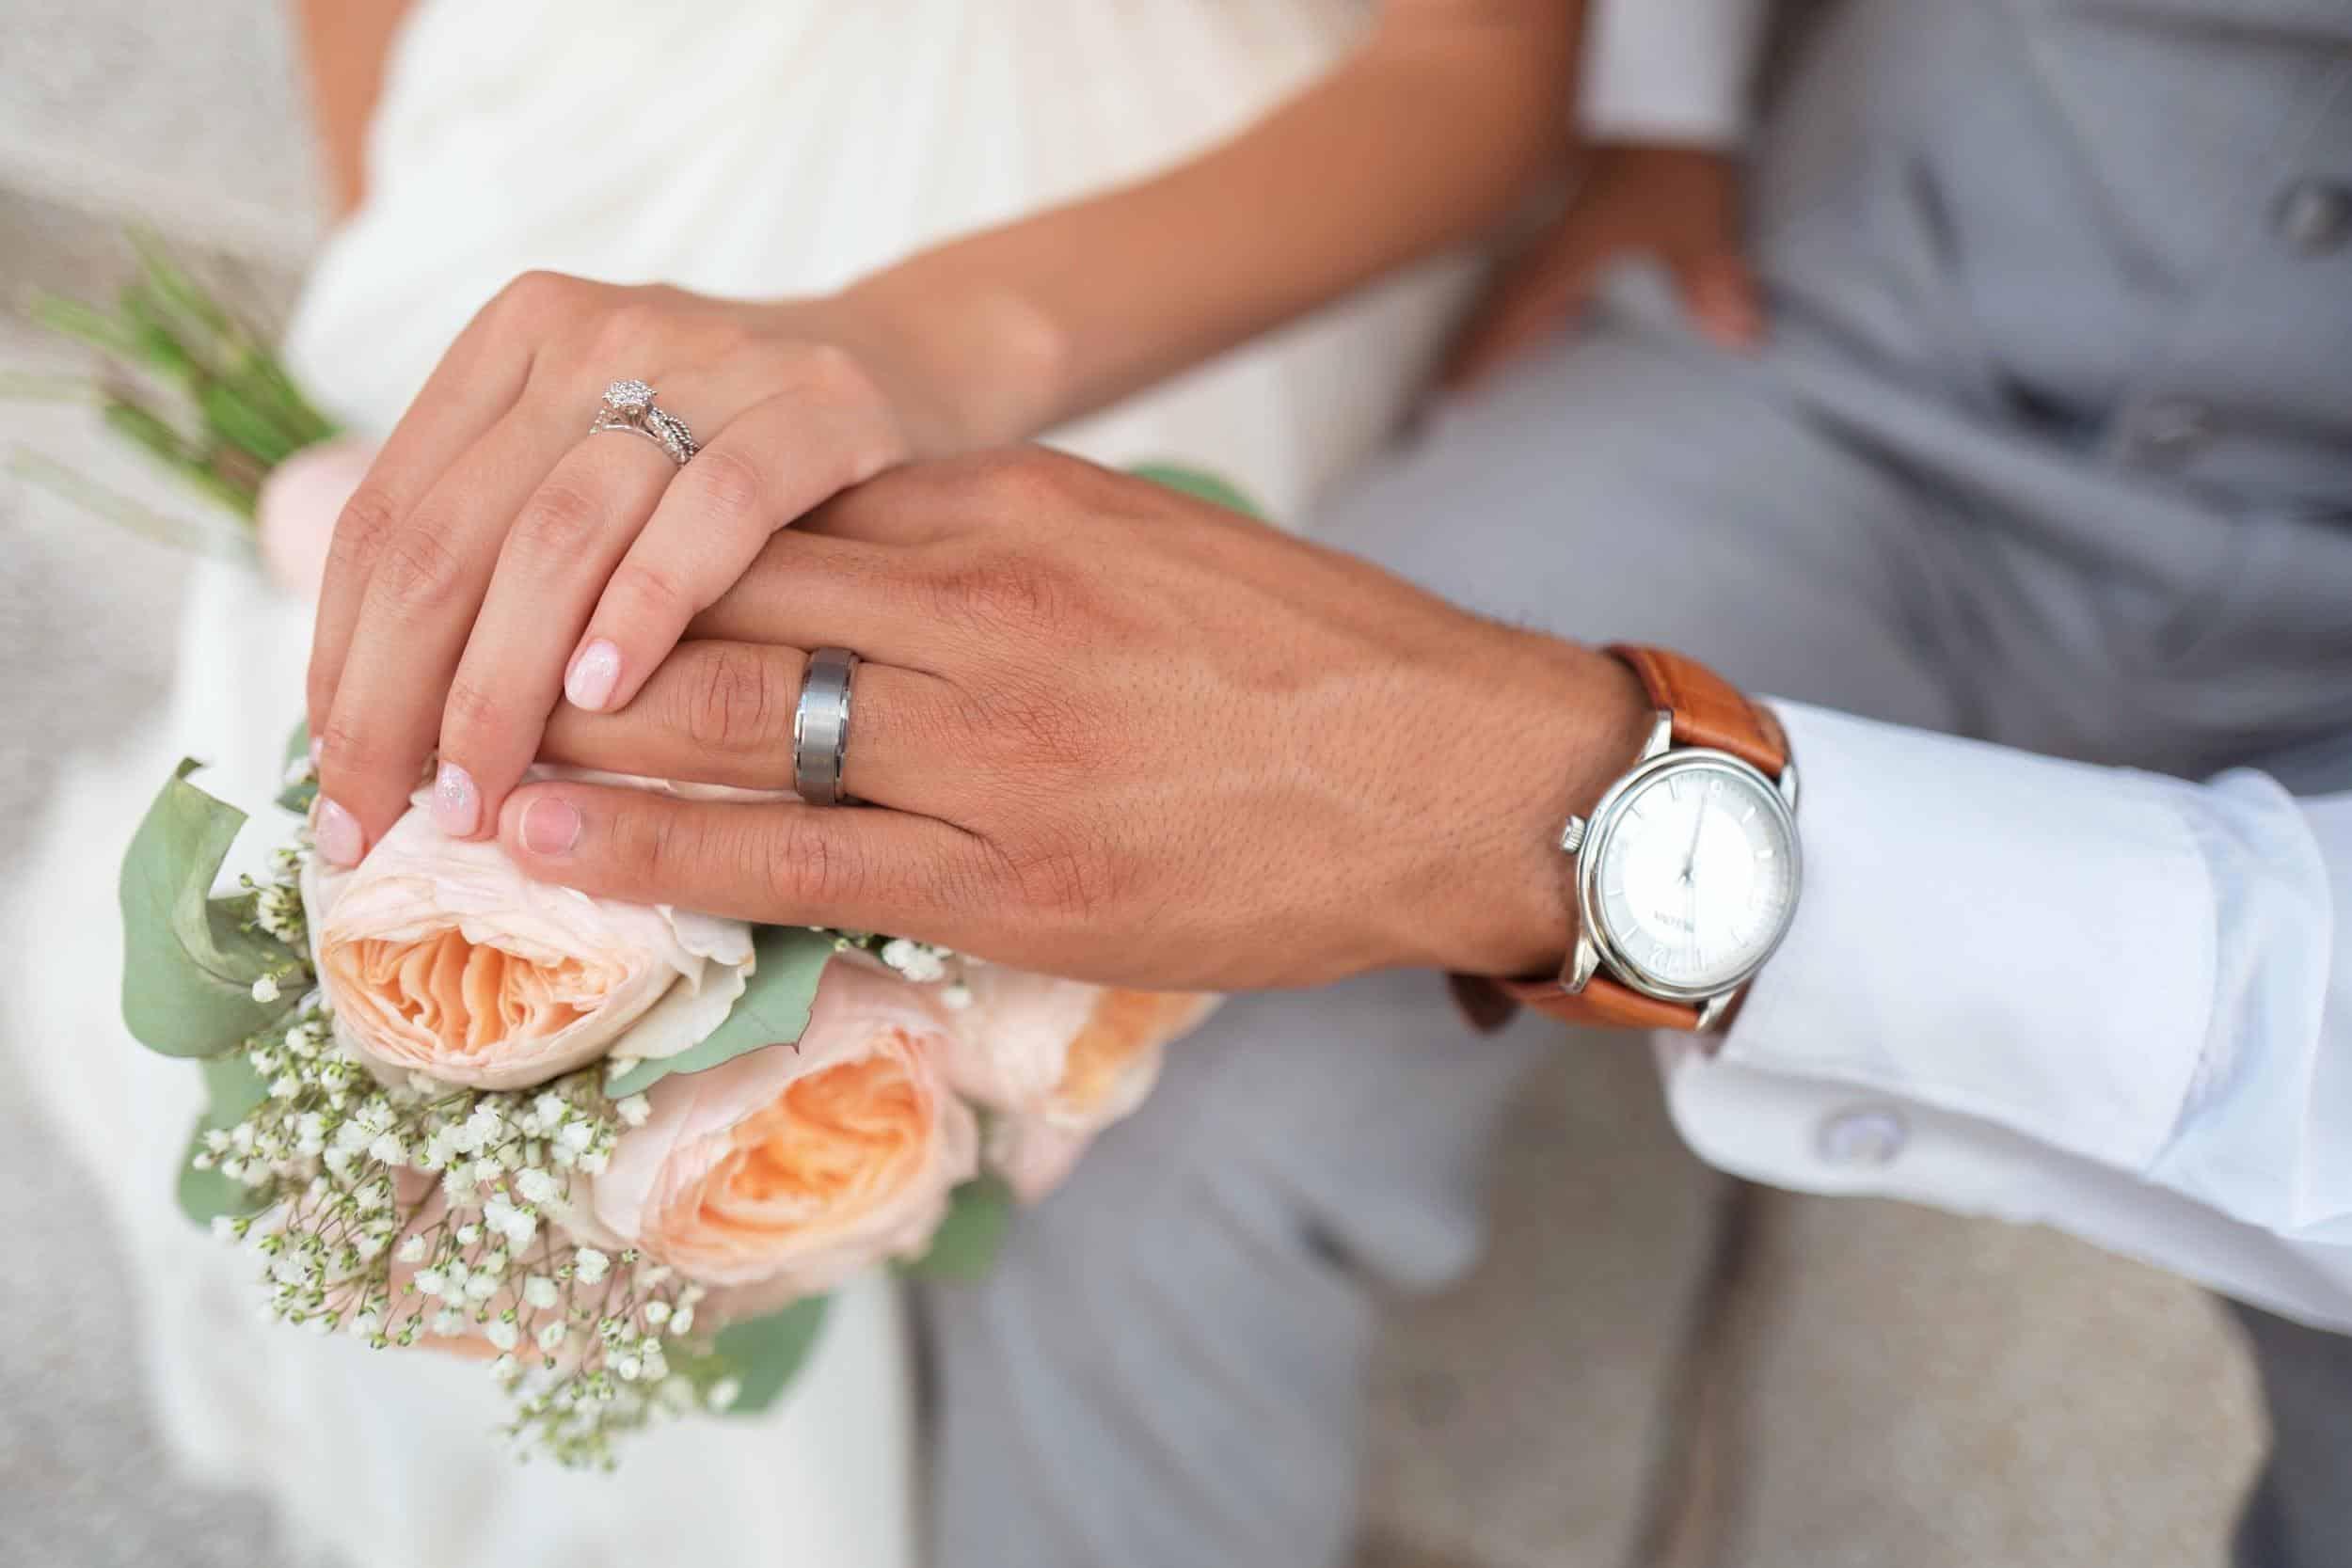 XXI Century Wedding: See How to Build Wedding Website